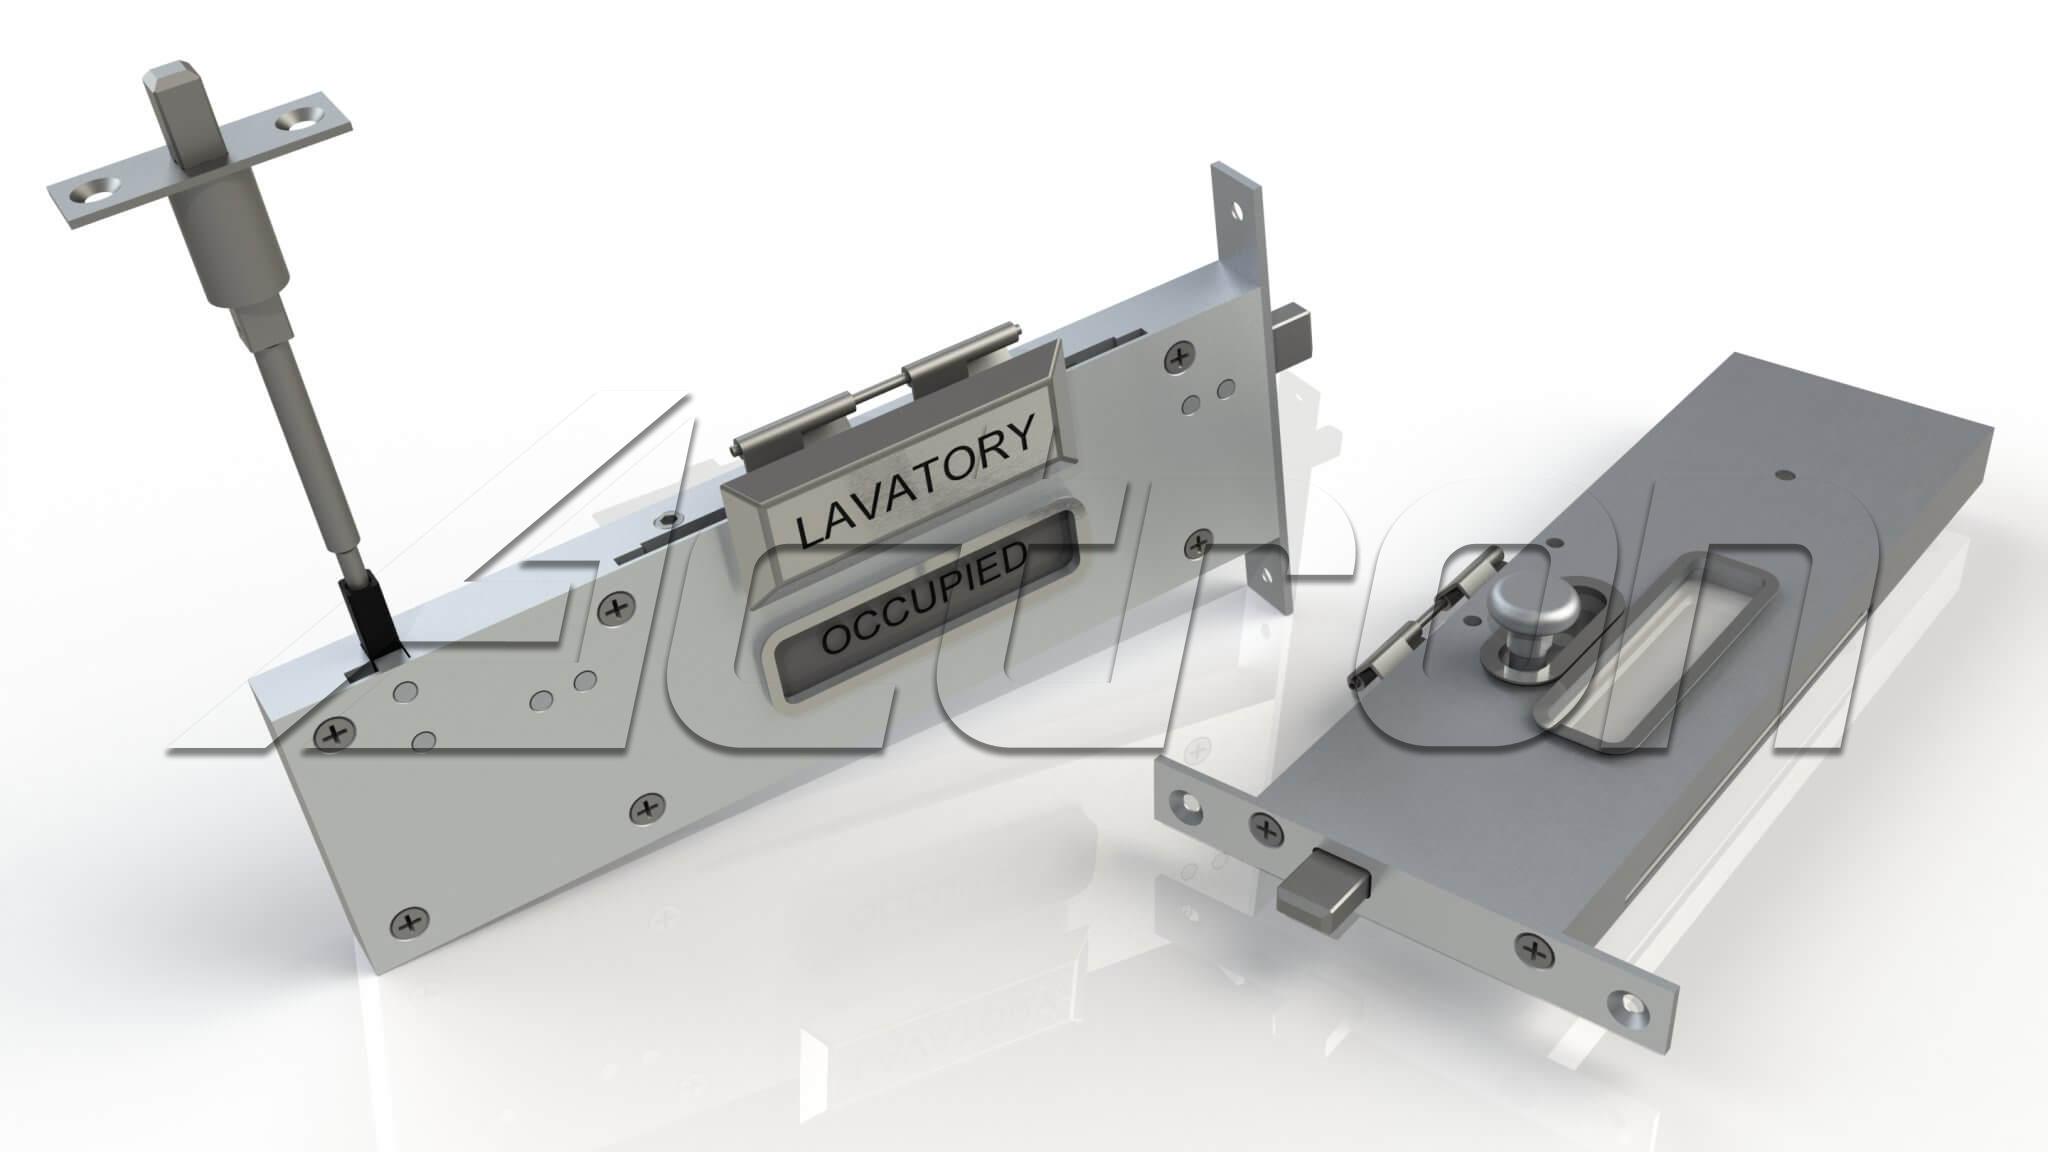 latch-assy-8211-lavatory-4963-a41125.jpg